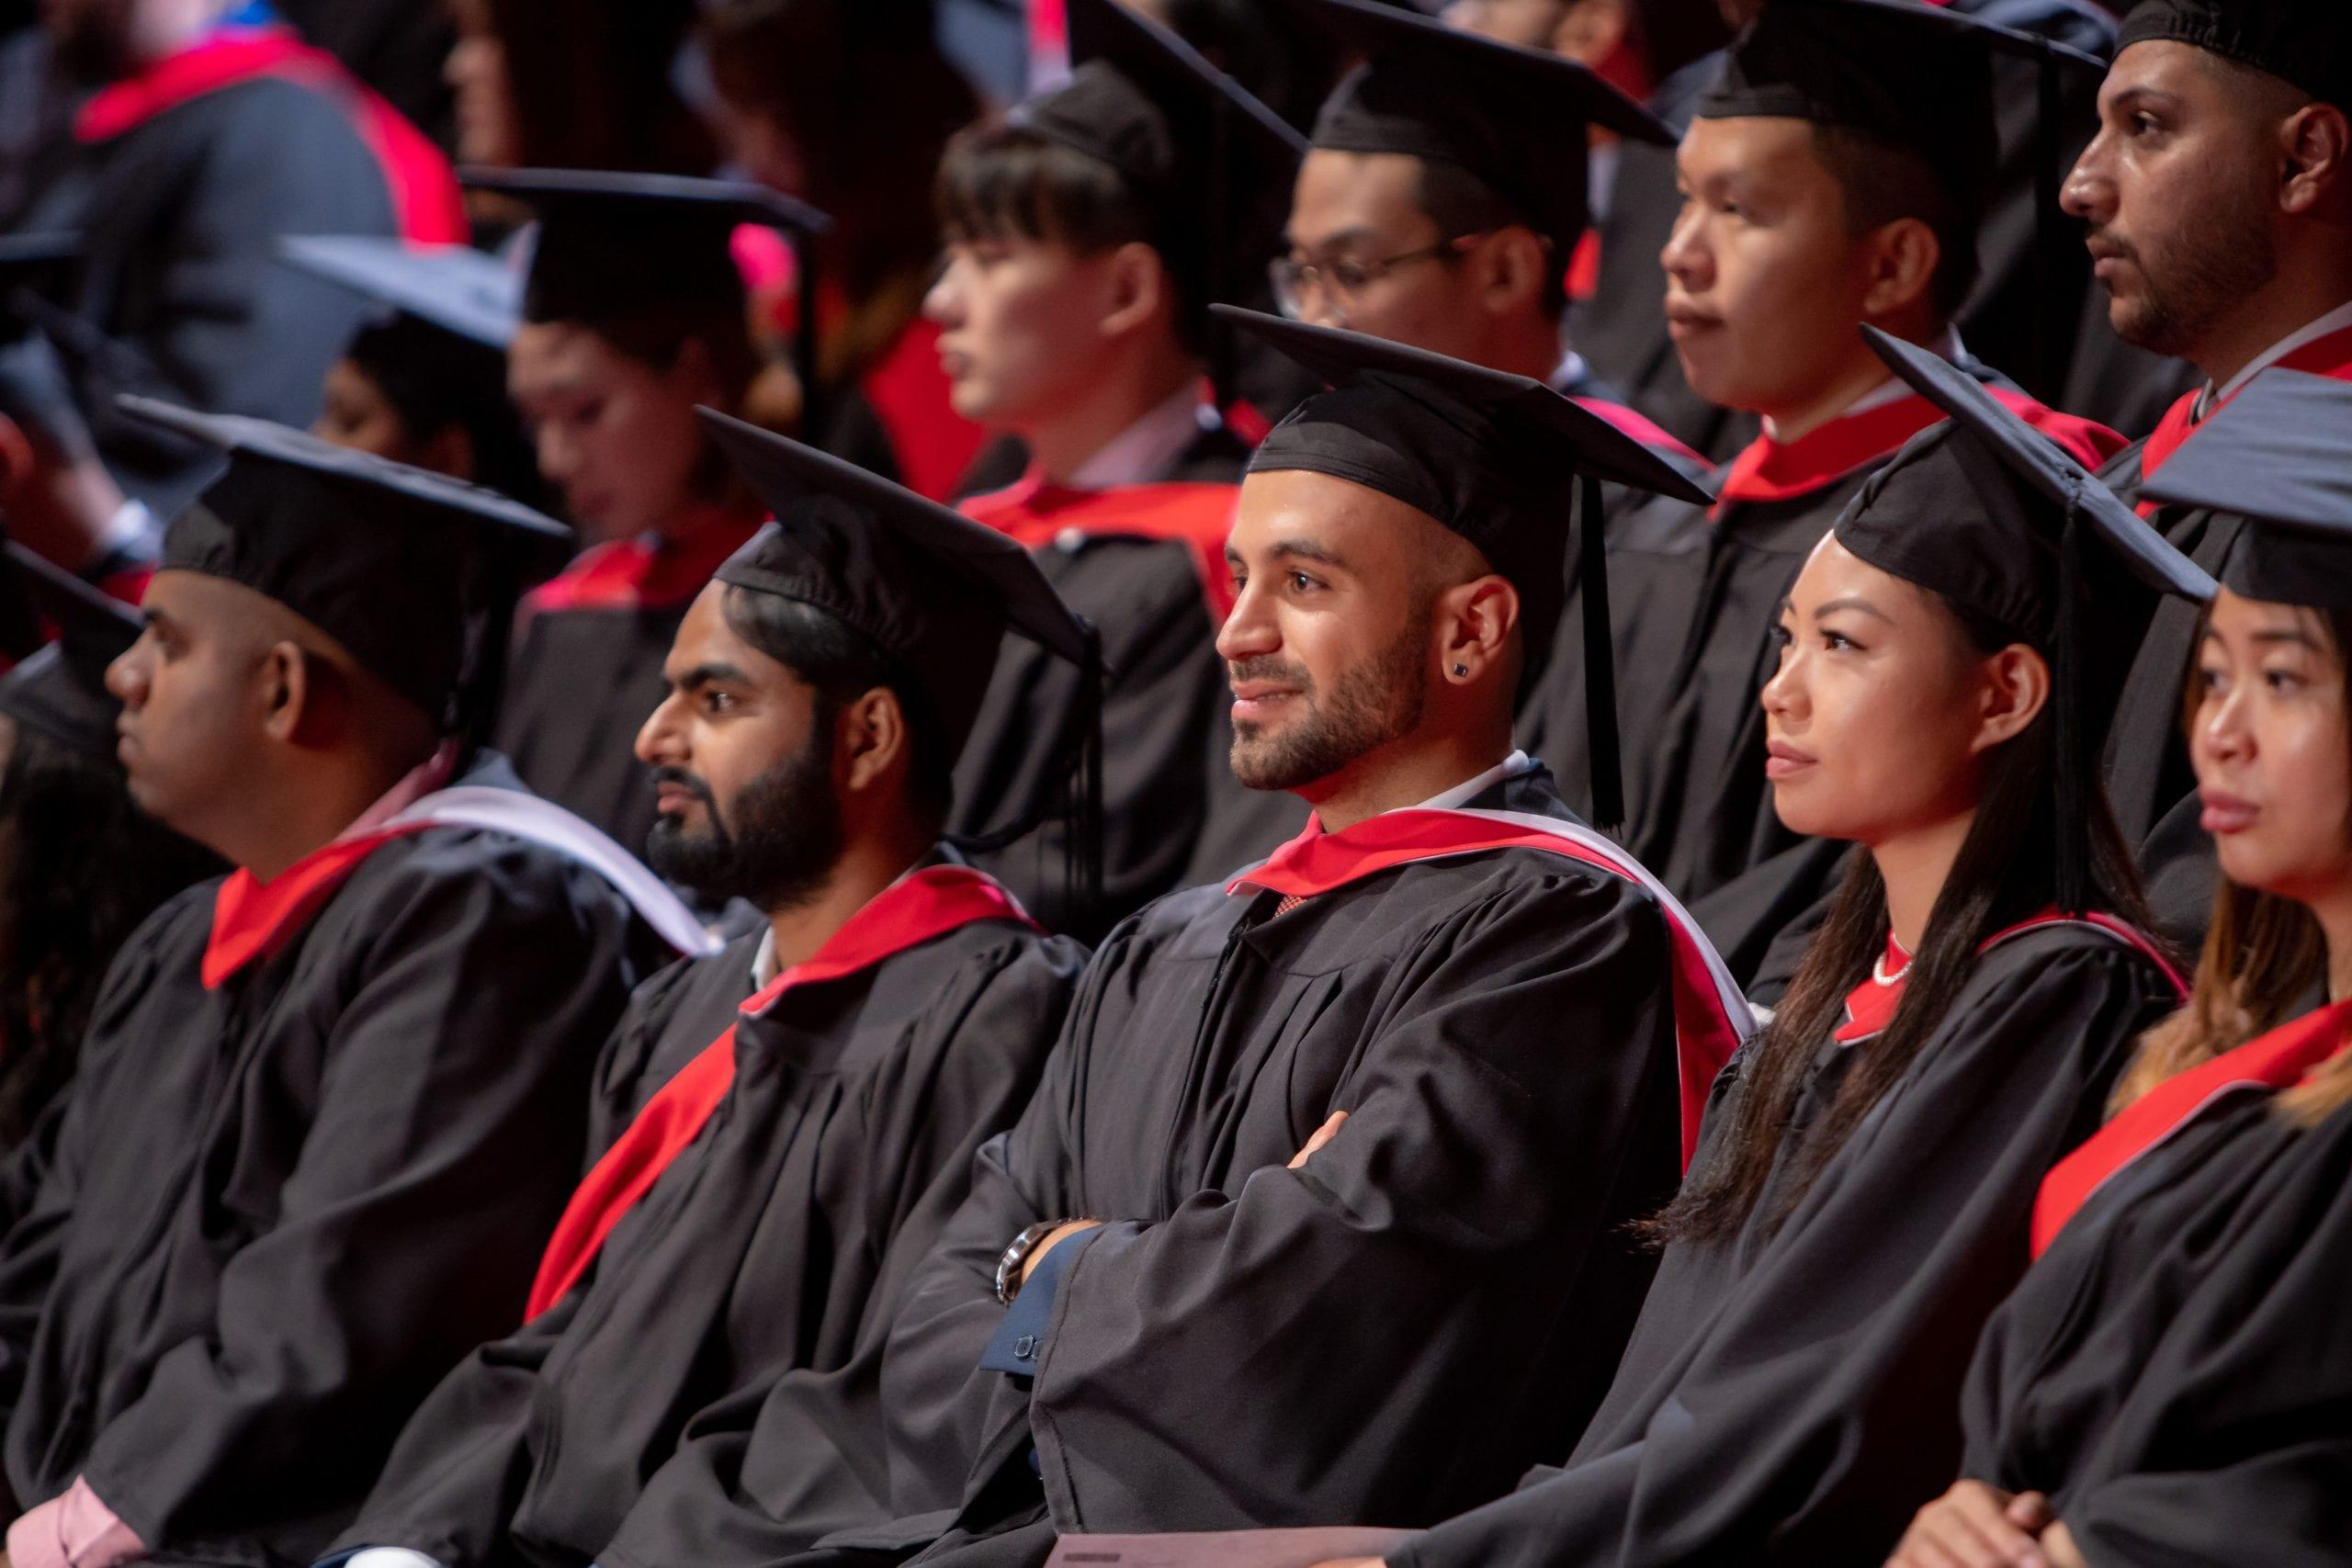 Graduate students gathered at graduate ceremony